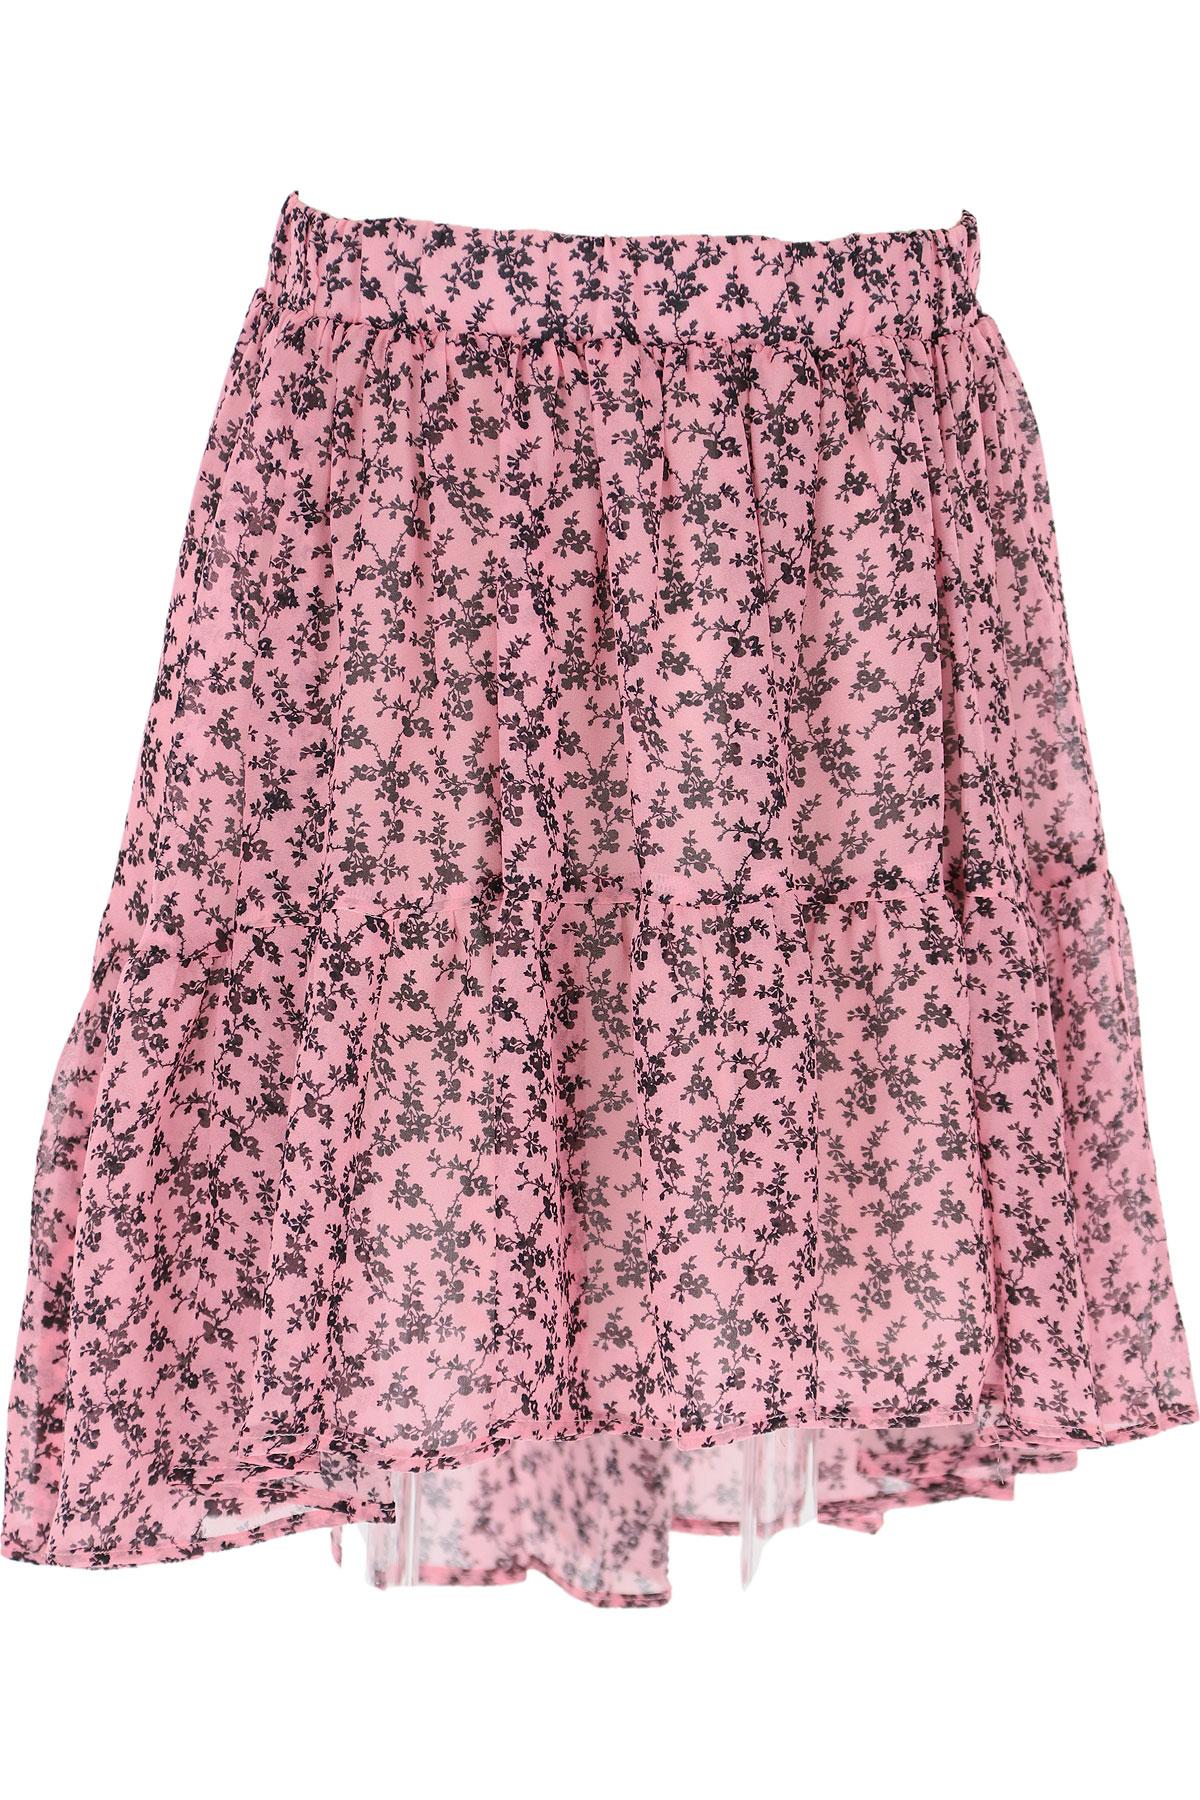 Philosophy di Lorenzo Serafini Kids Skirts for Girls On Sale, Mauve pink, Viscose, 2019, L M S XL XS XXS